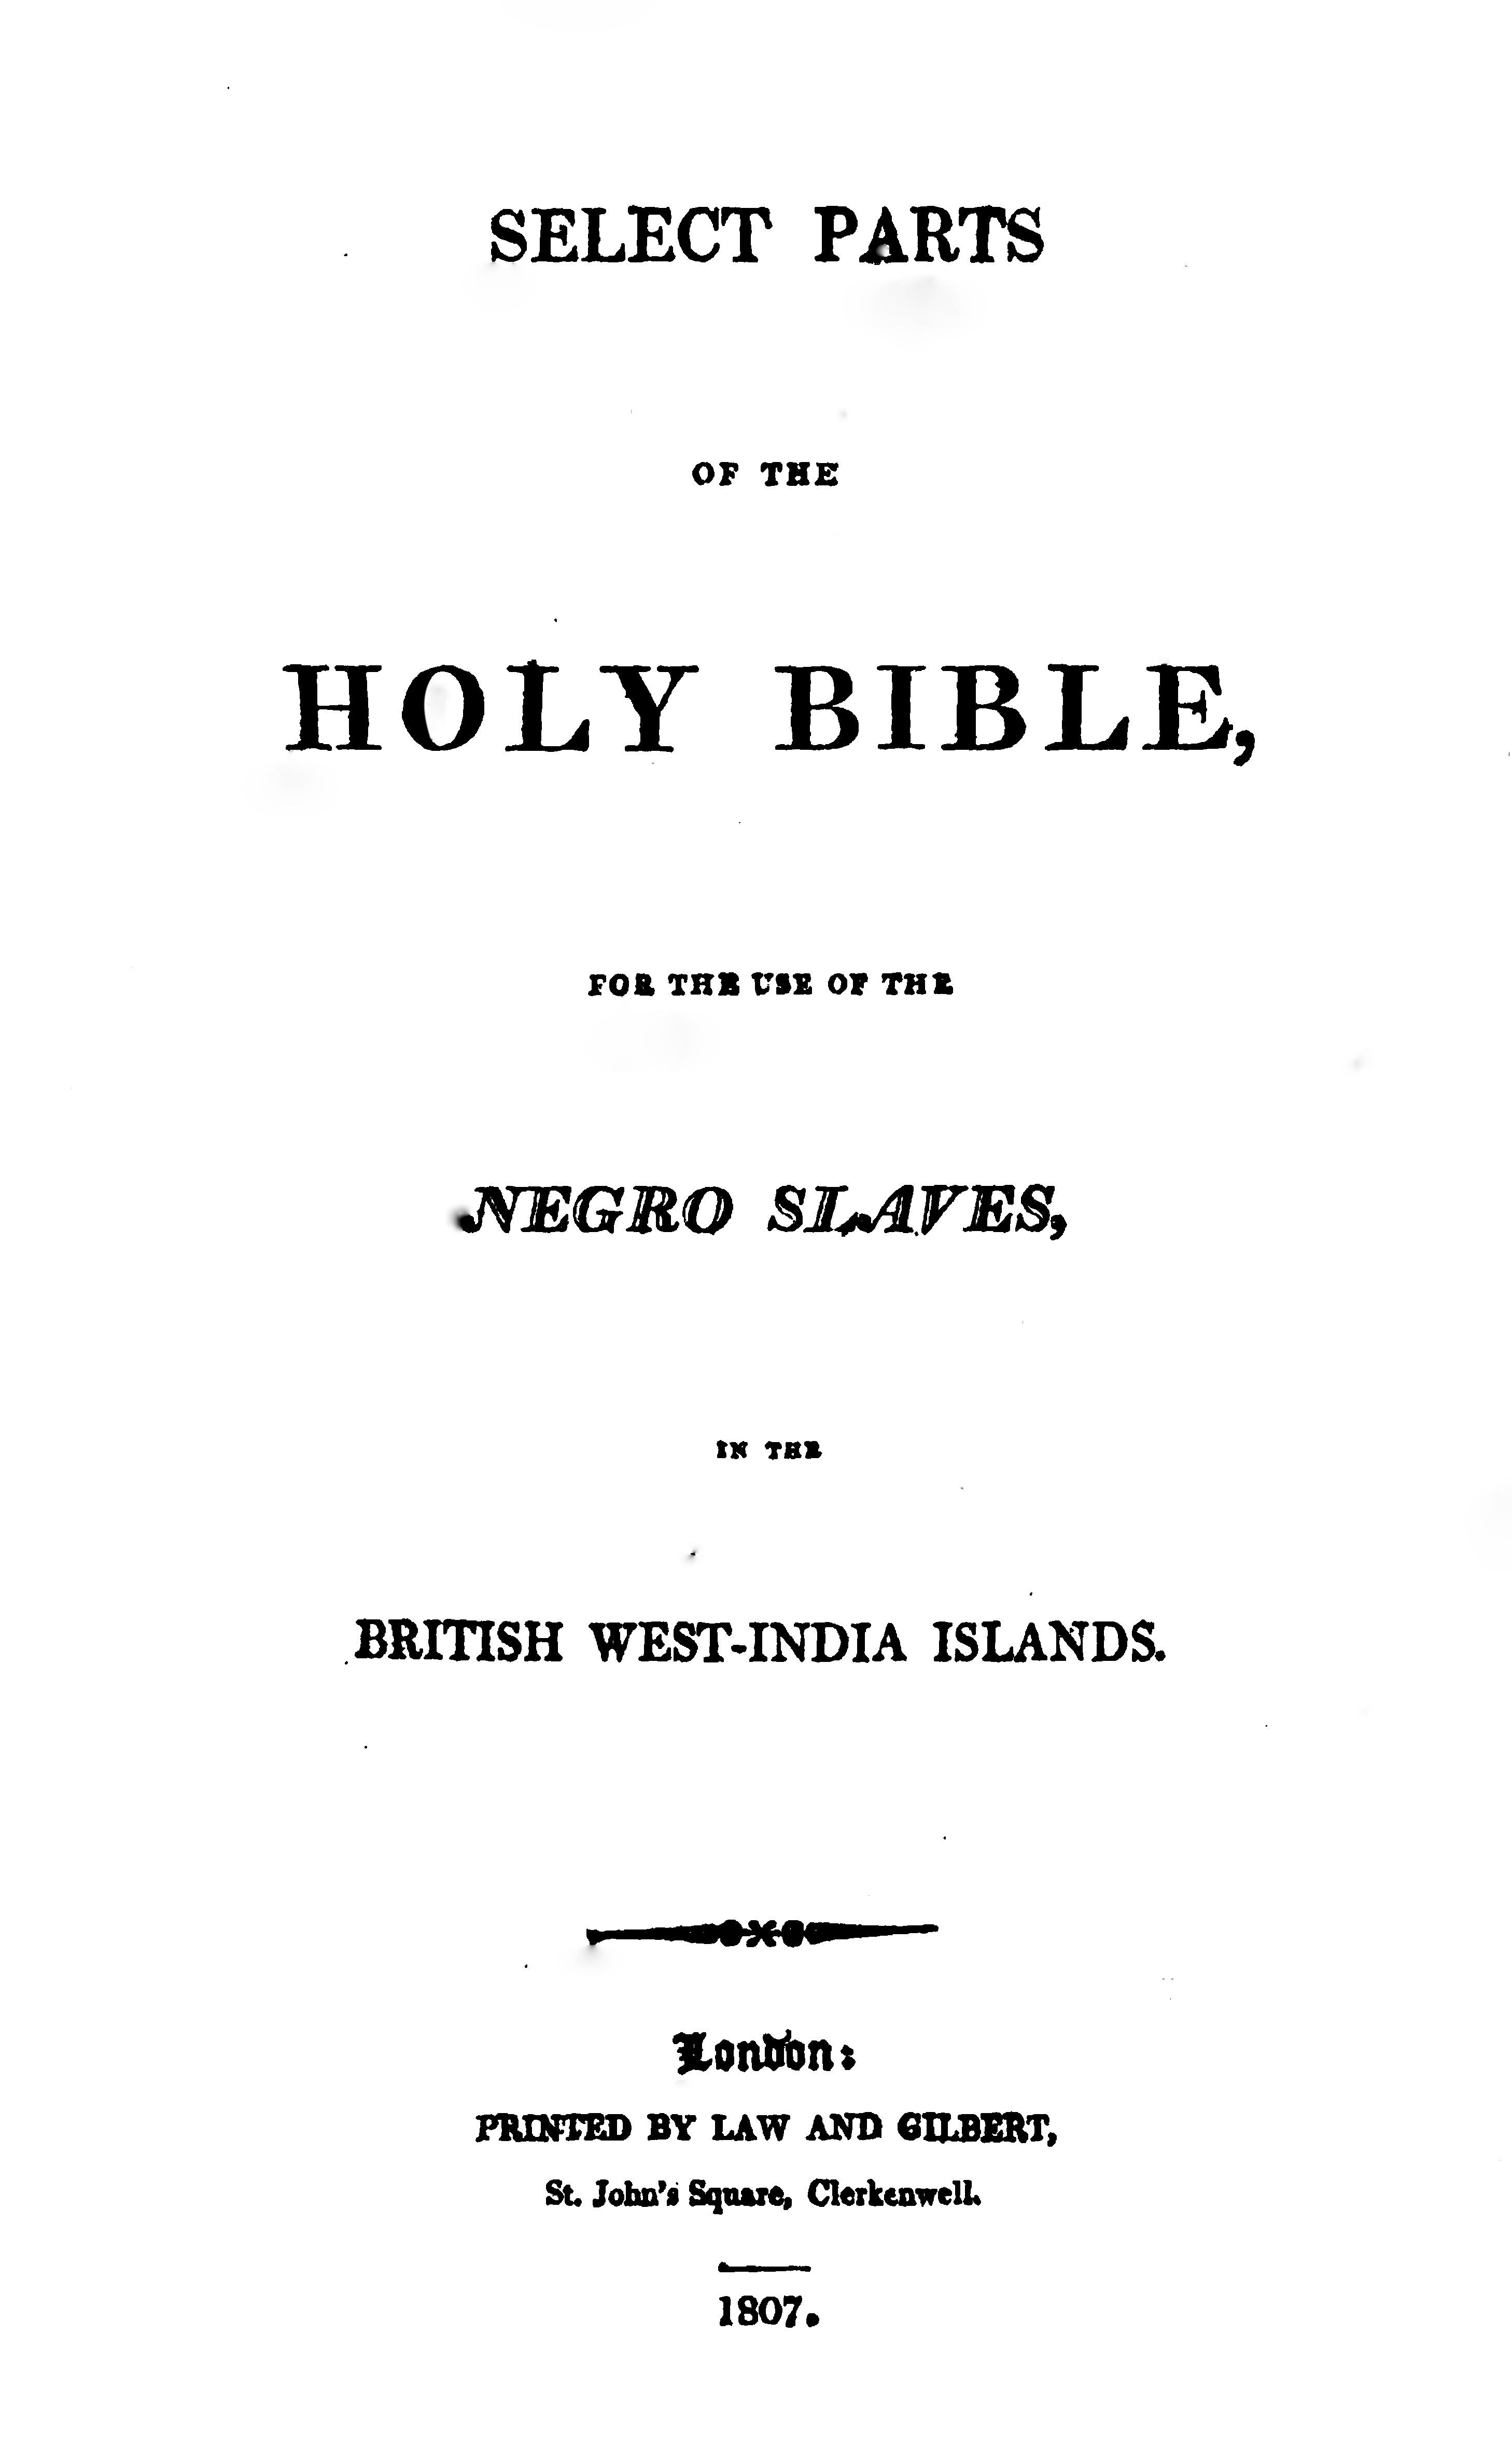 Slave bible - Wikipedia